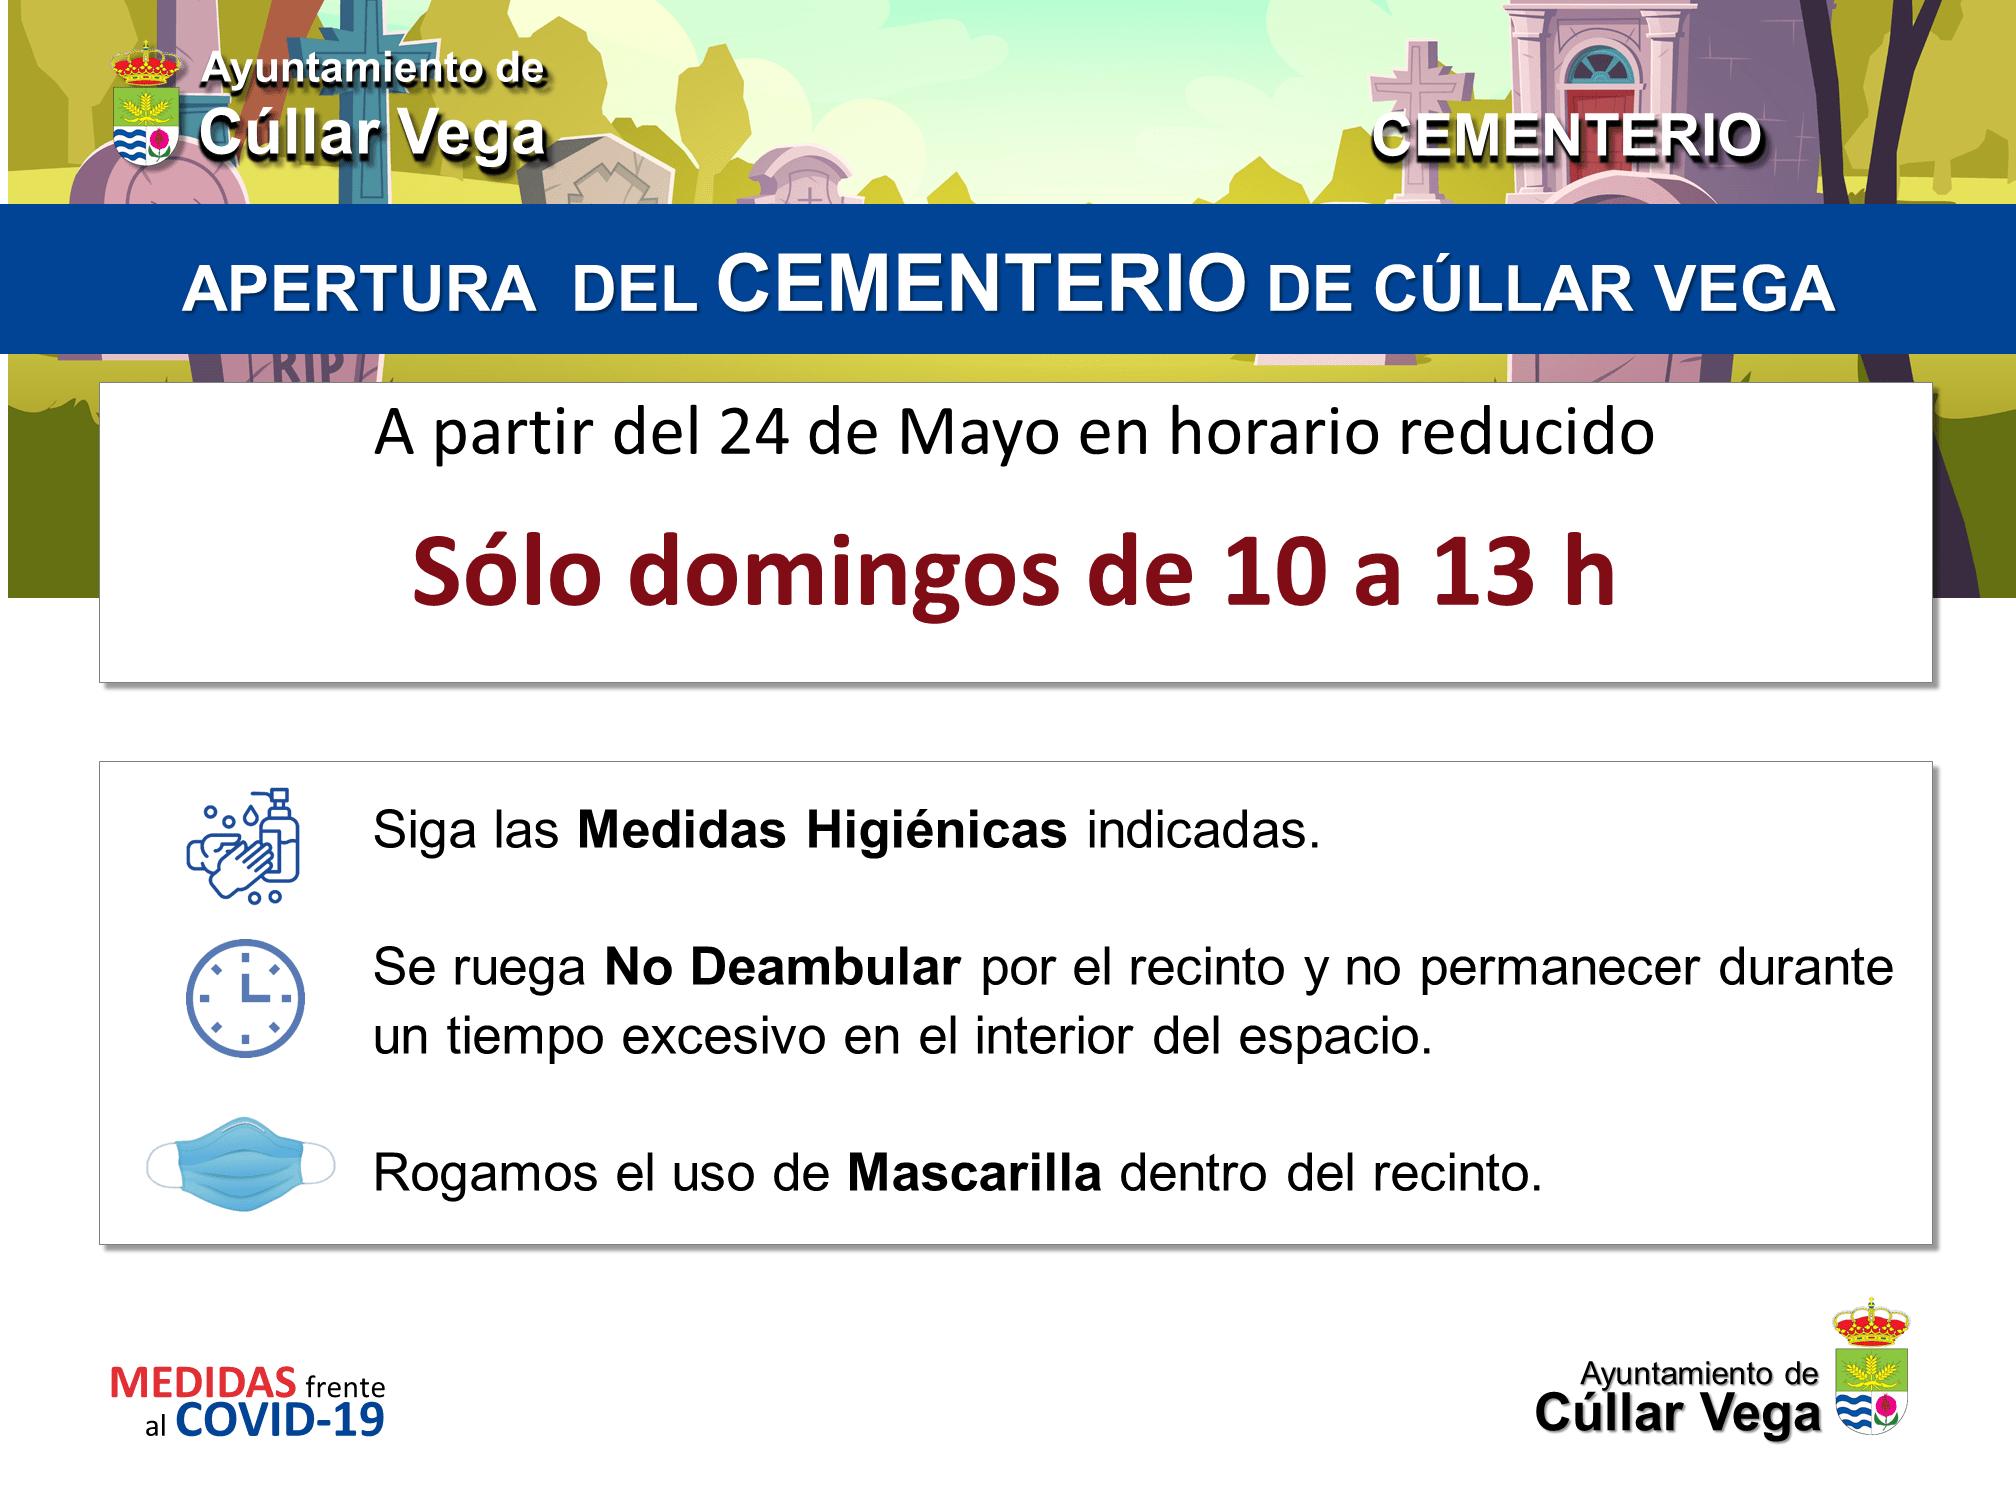 Apertura del Cementerio de Cúllar Vega